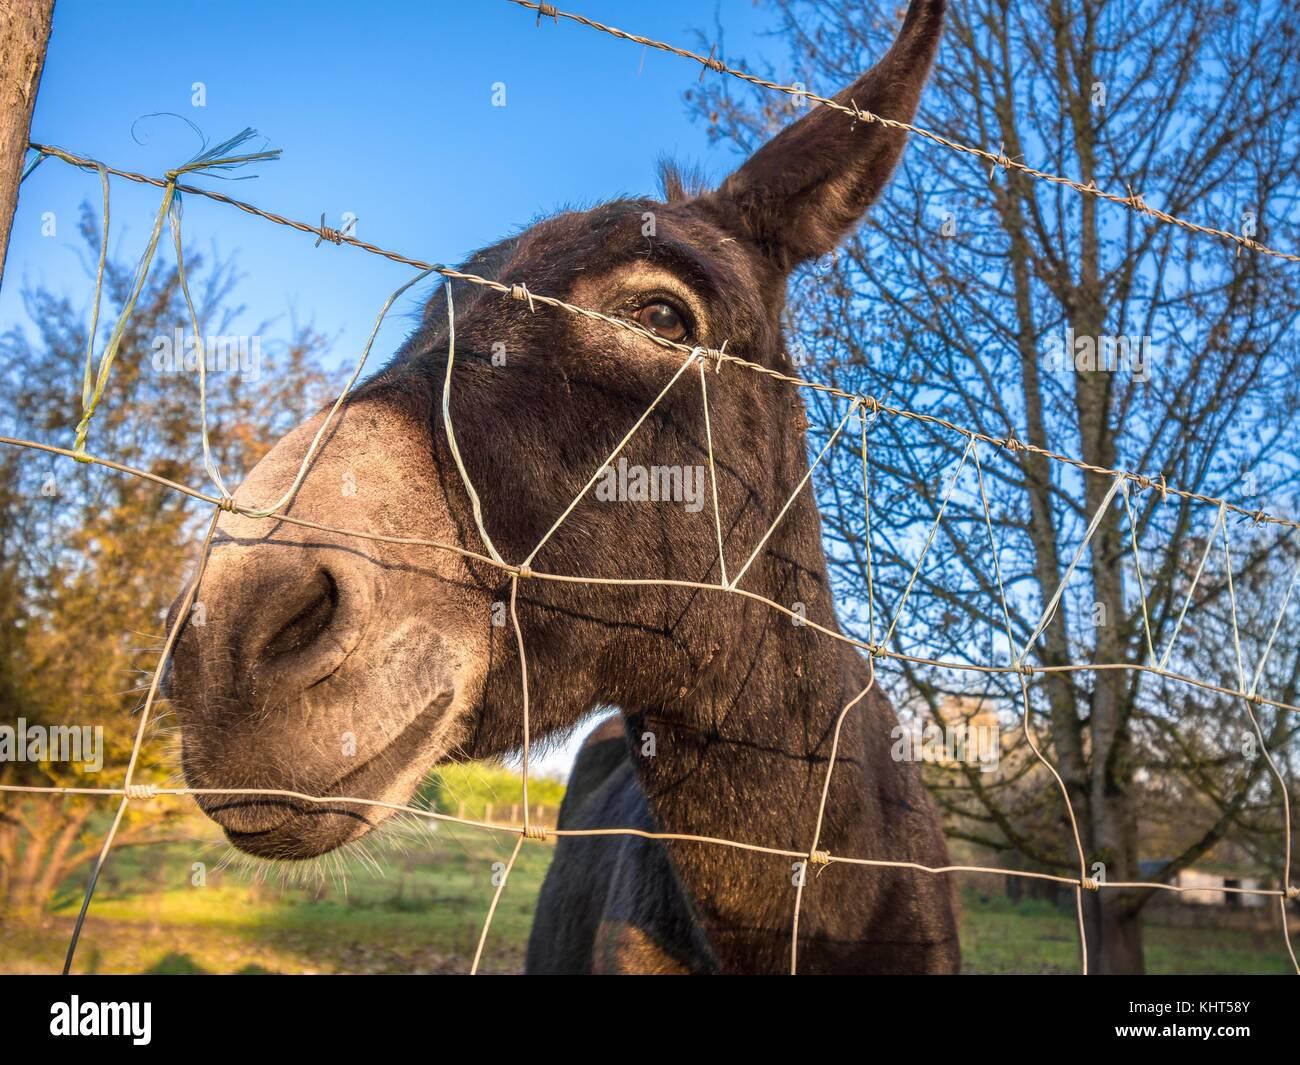 Donkey behind wire fence. - Stock Image